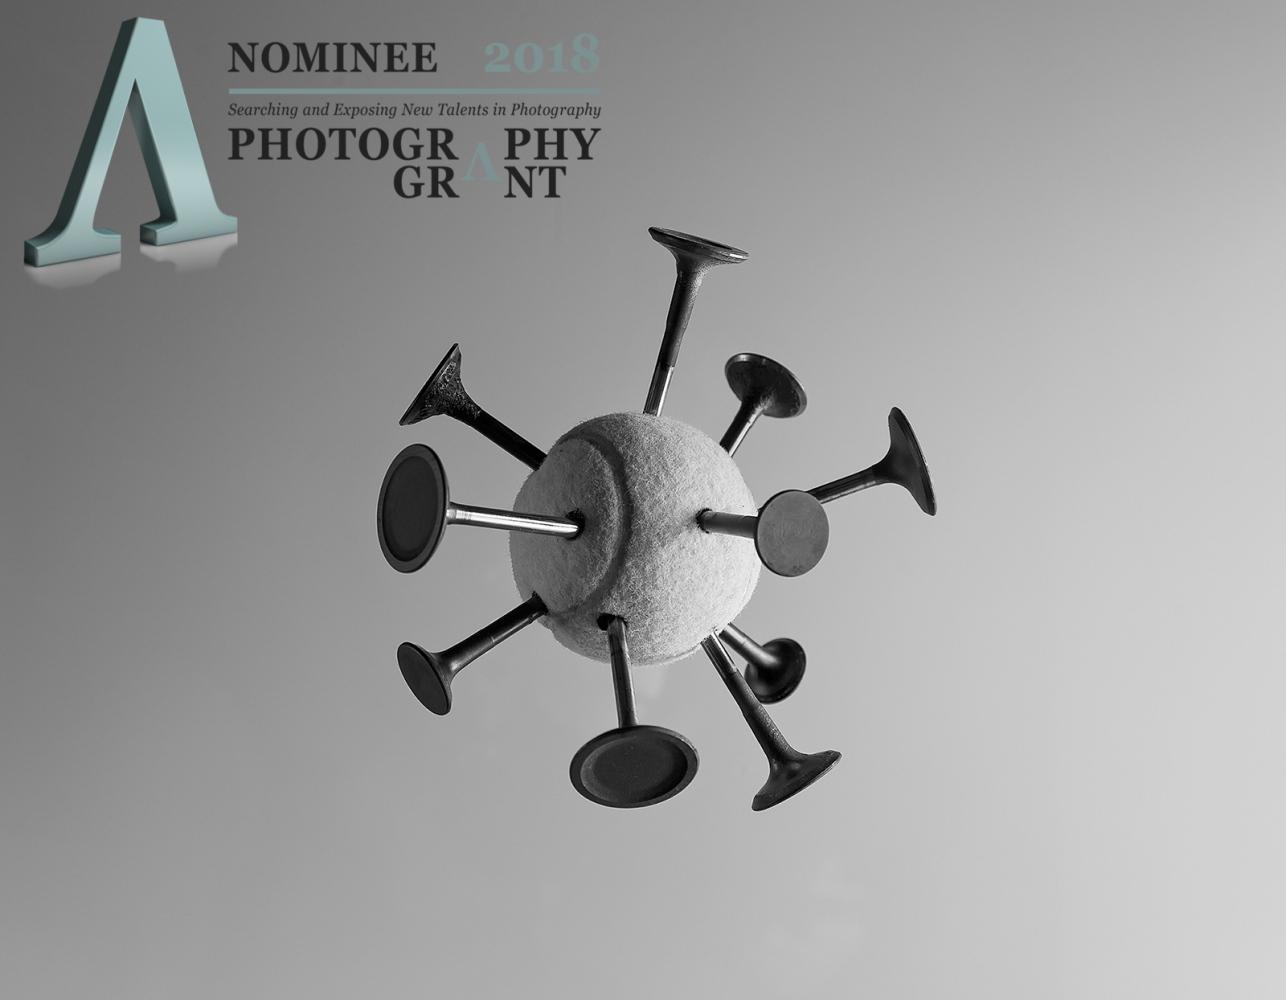 Photography image - Loading Abstracto-3581-bn-Gran.jpg